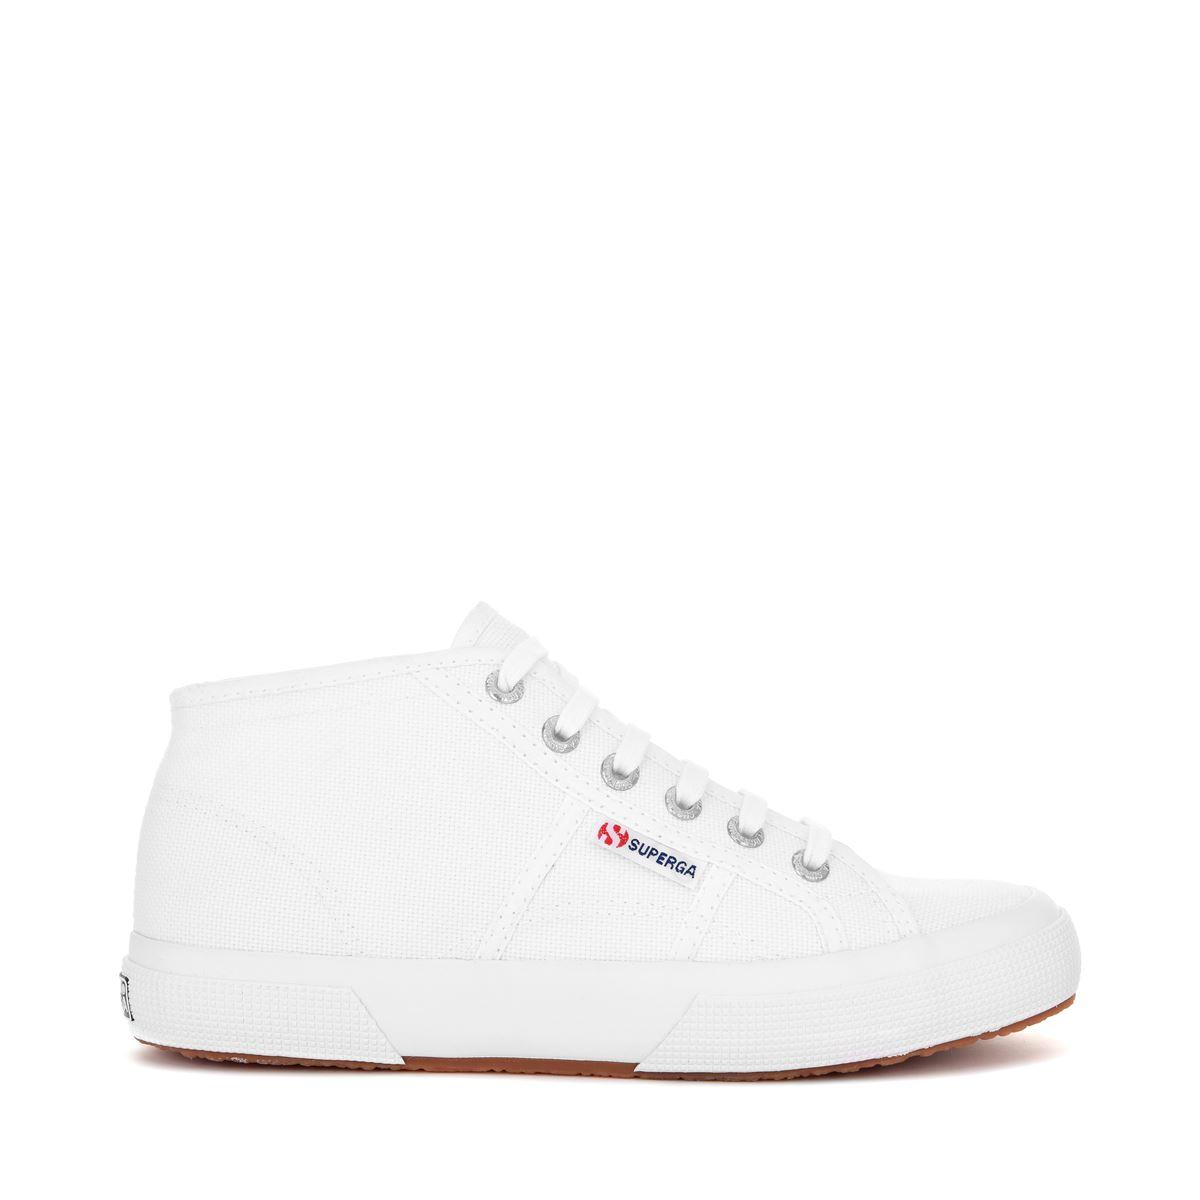 Scarpe-ginnastica-Medio-Superga-Uomo-Donna-White-DD